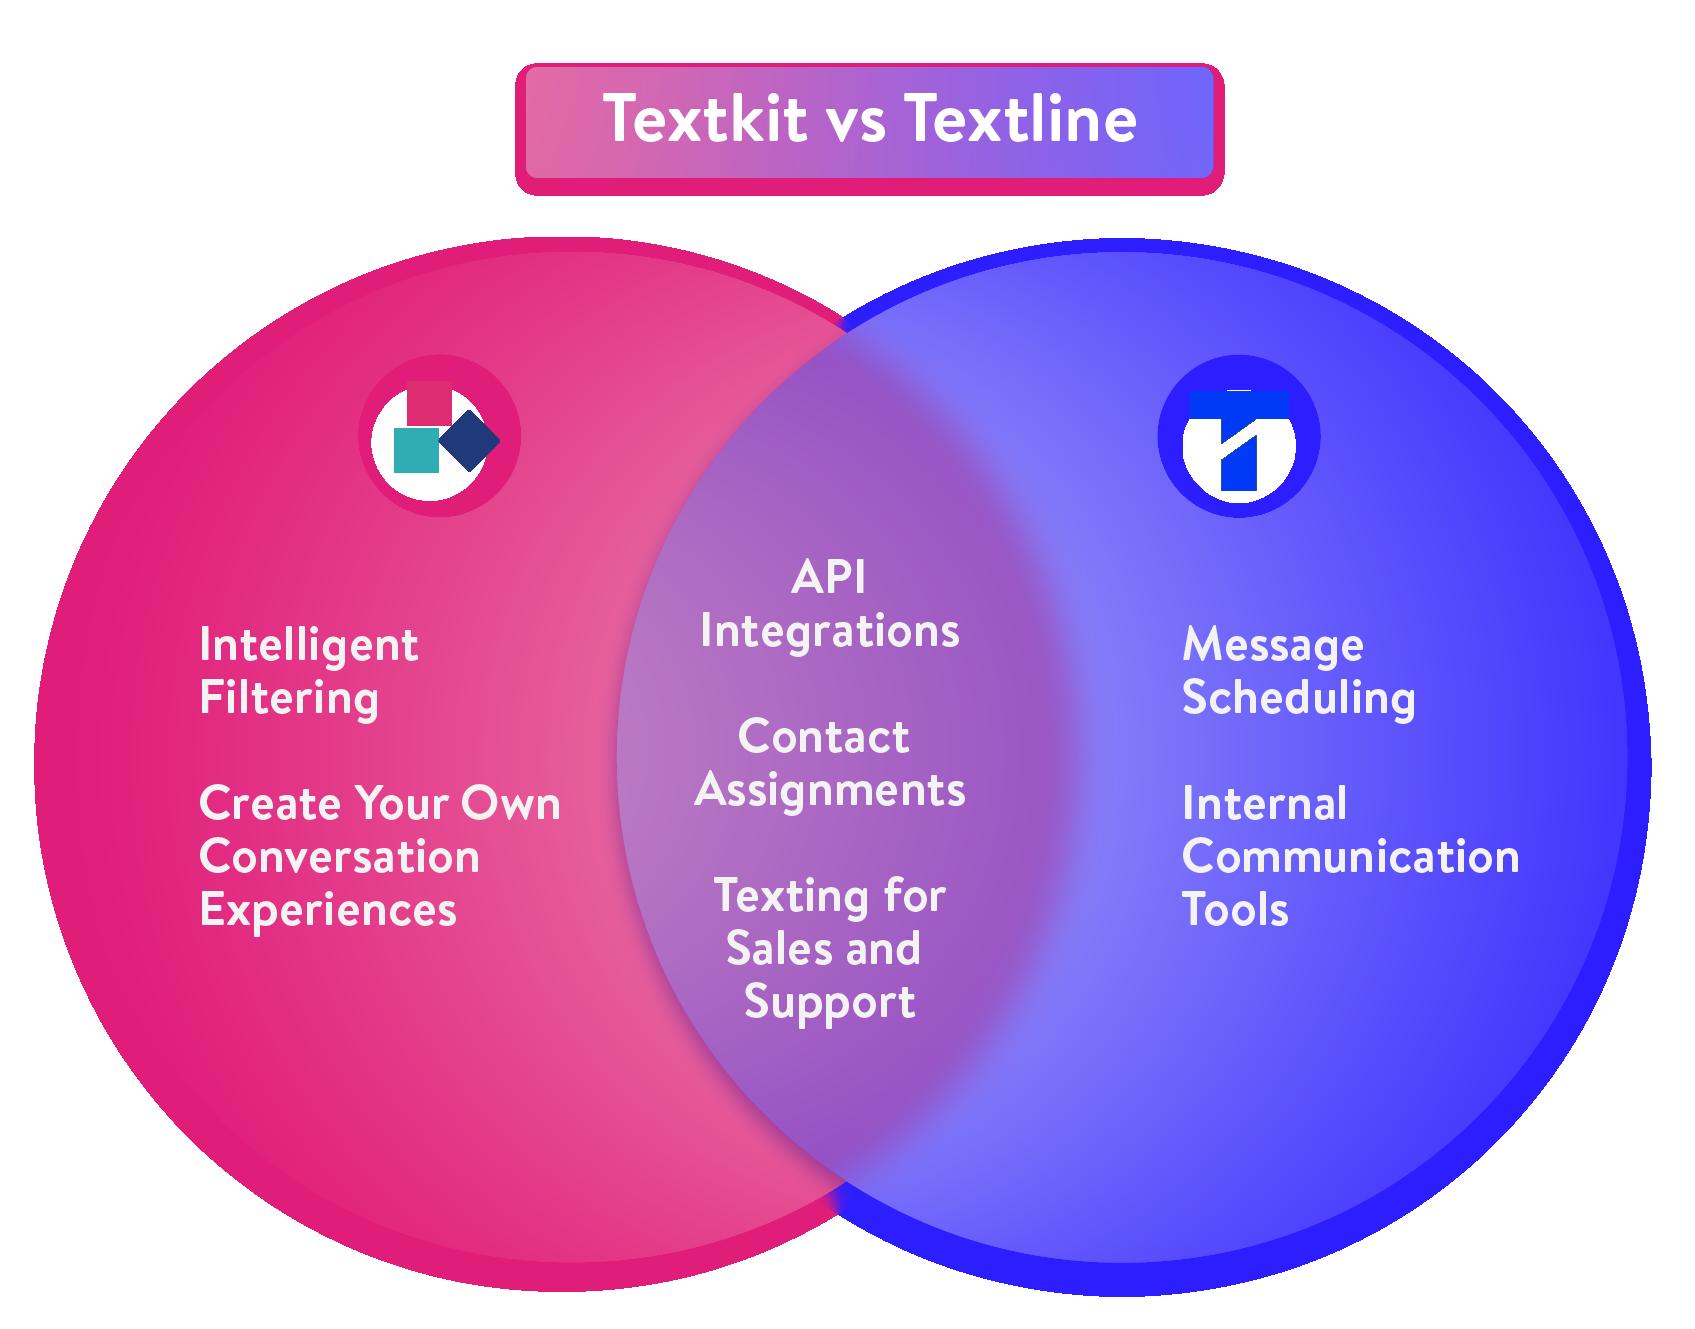 TextKit vs Textline